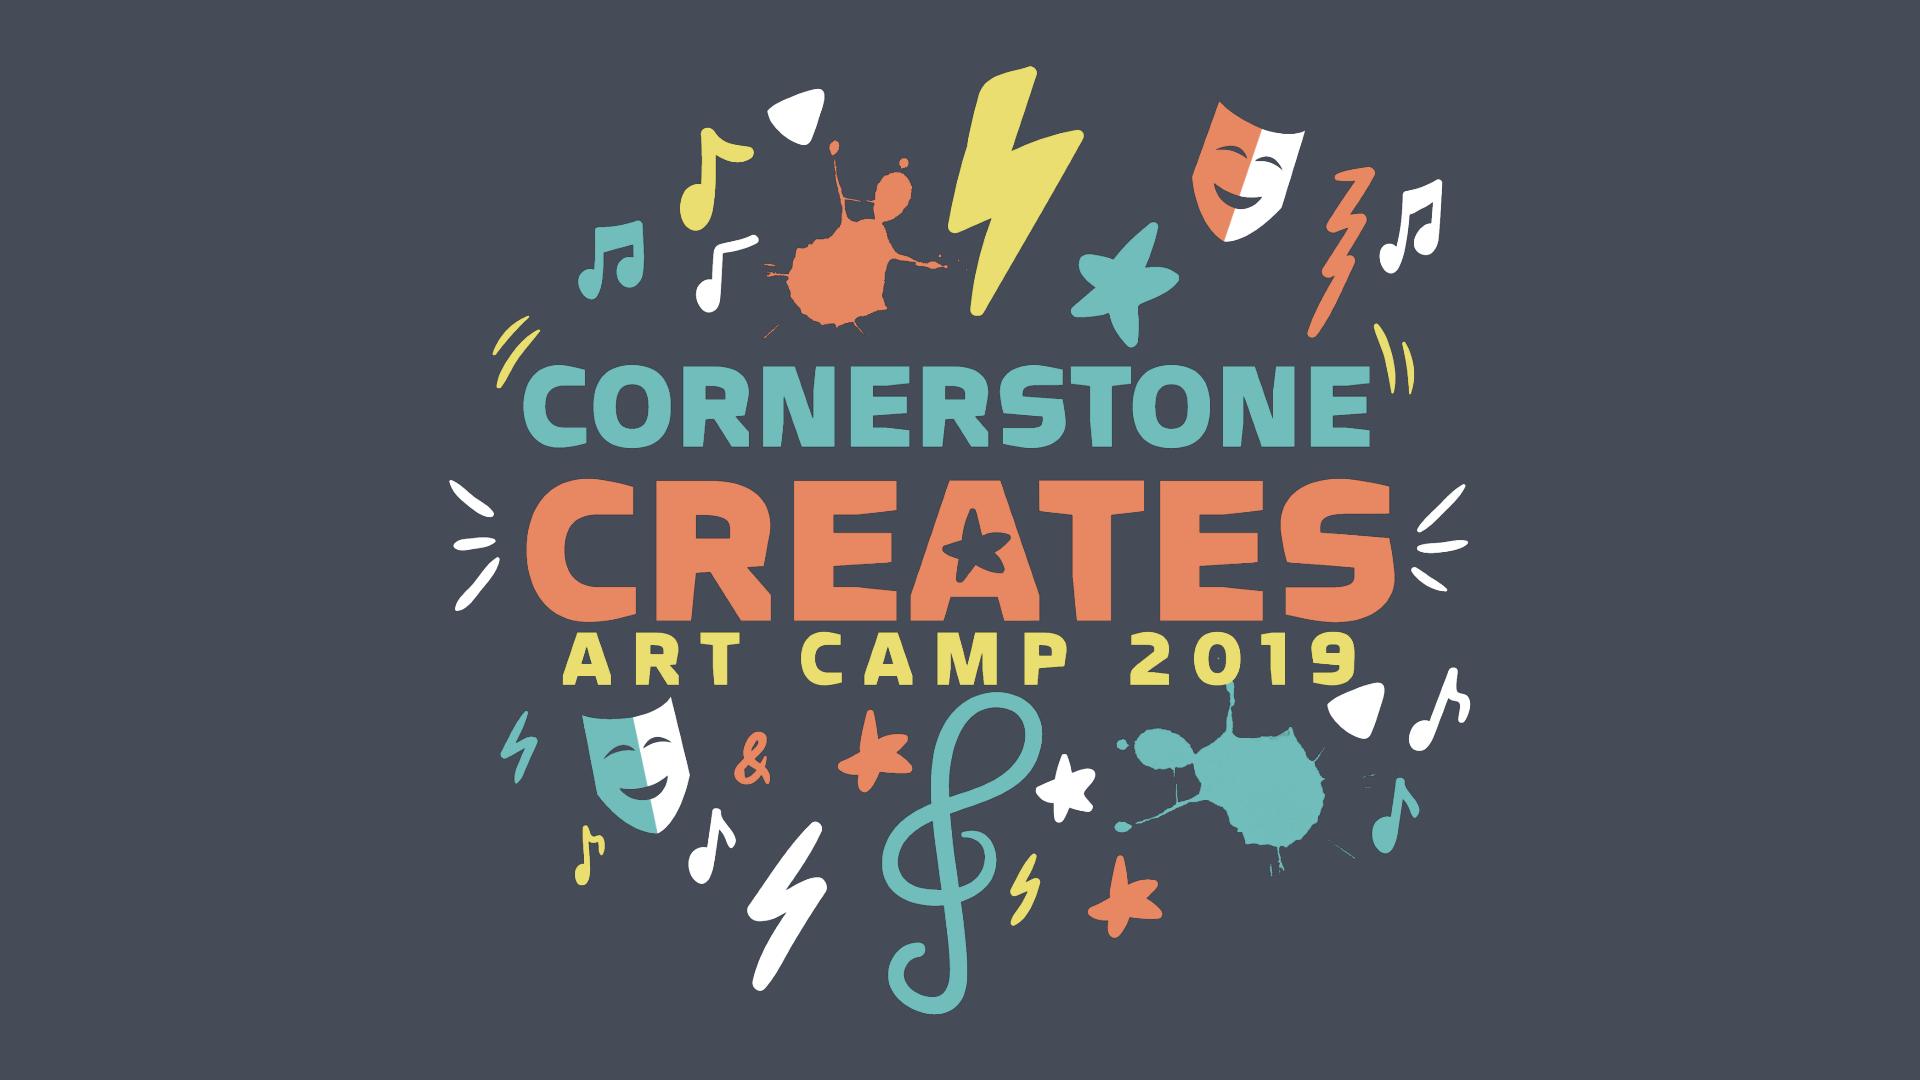 CornerstoneCreatesArtCamp.jpg